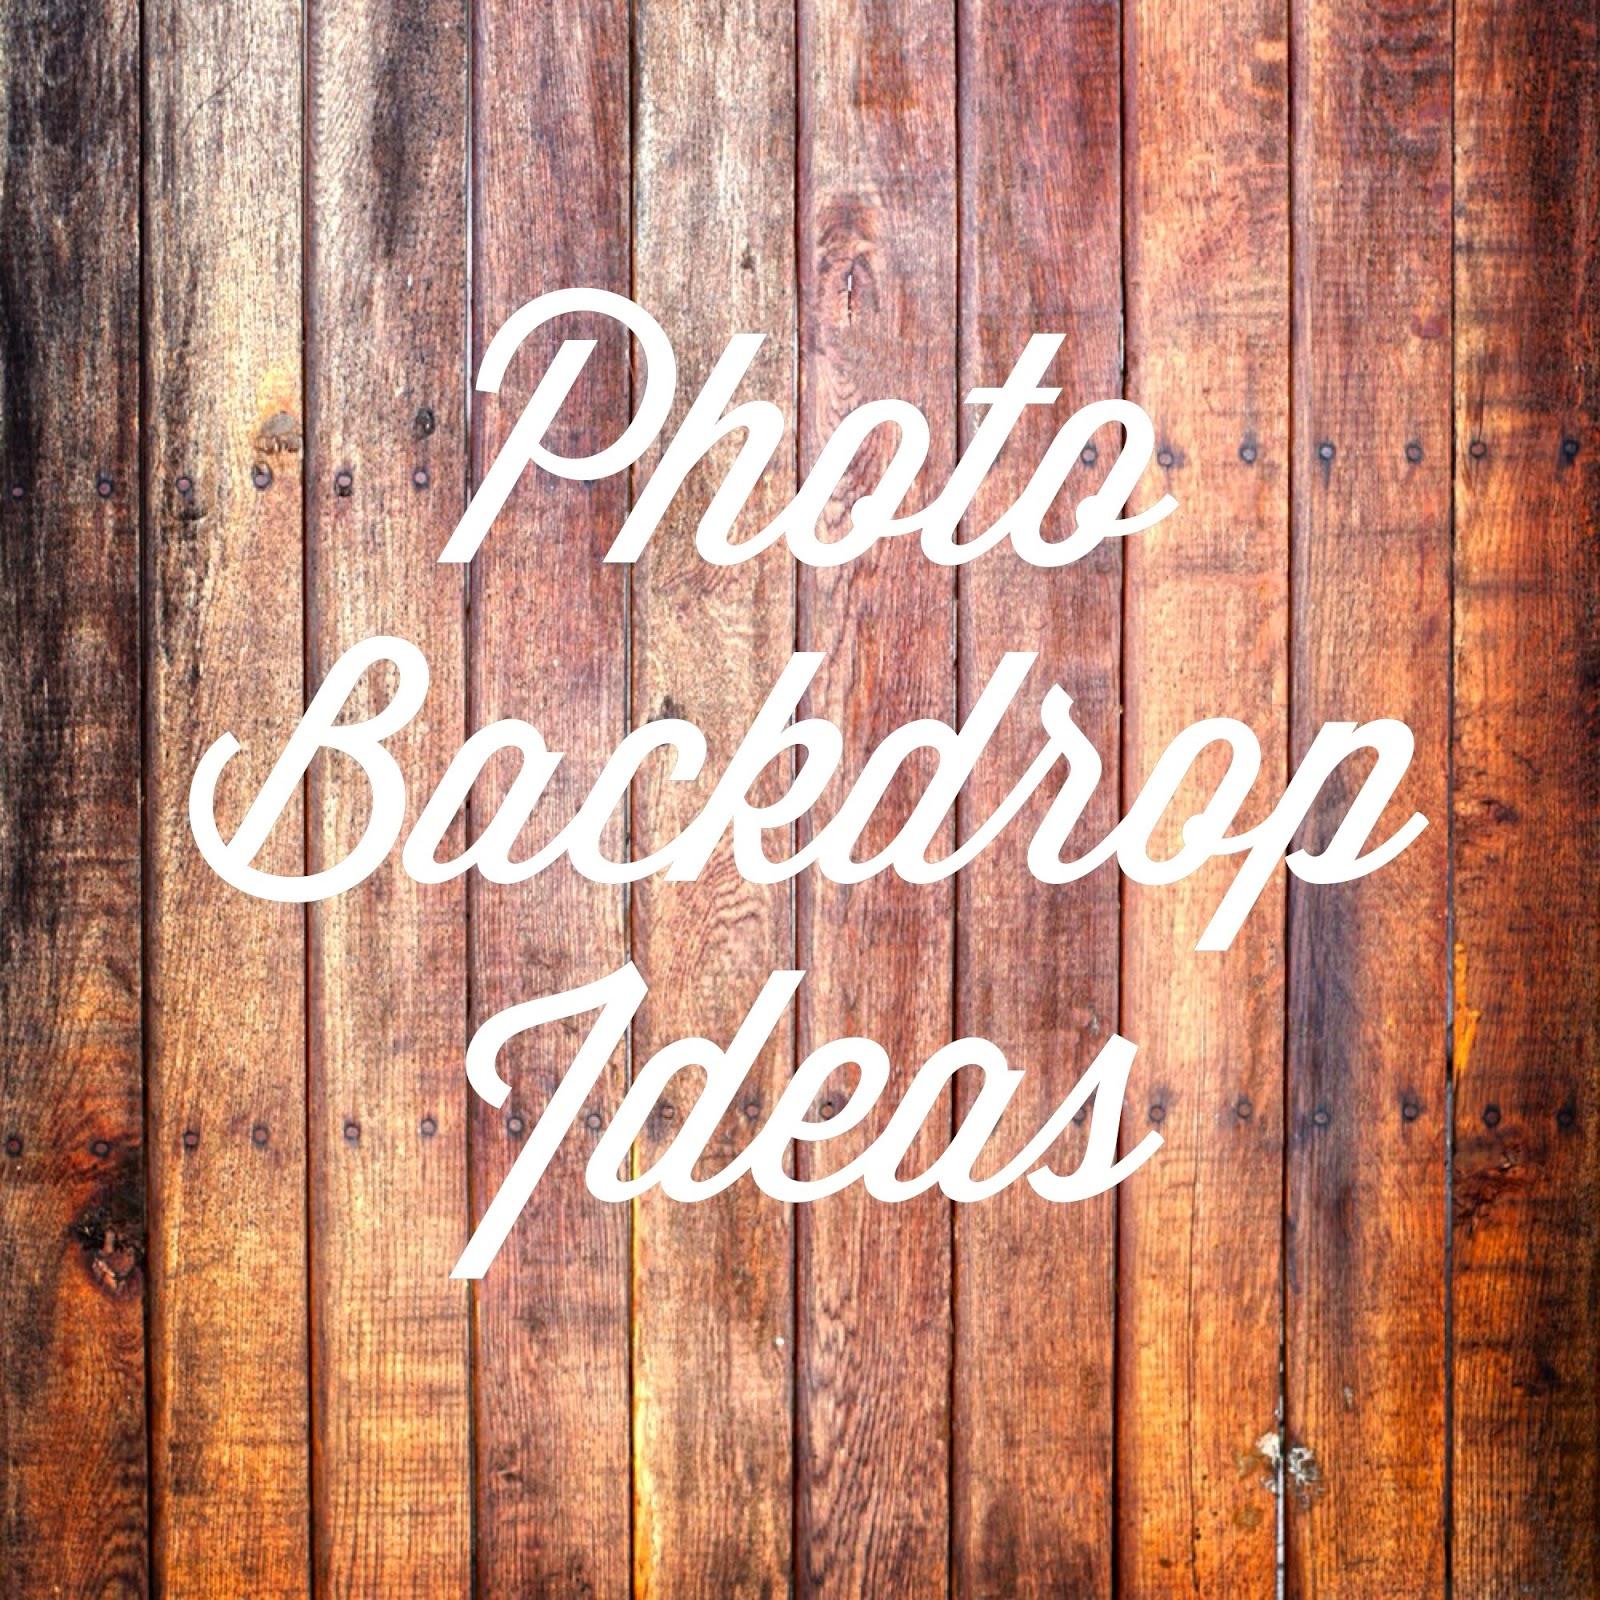 Wedding Photo Backdrop Ideas: Weddings At Wilderness Ridge: Photo Backdrop Ideas